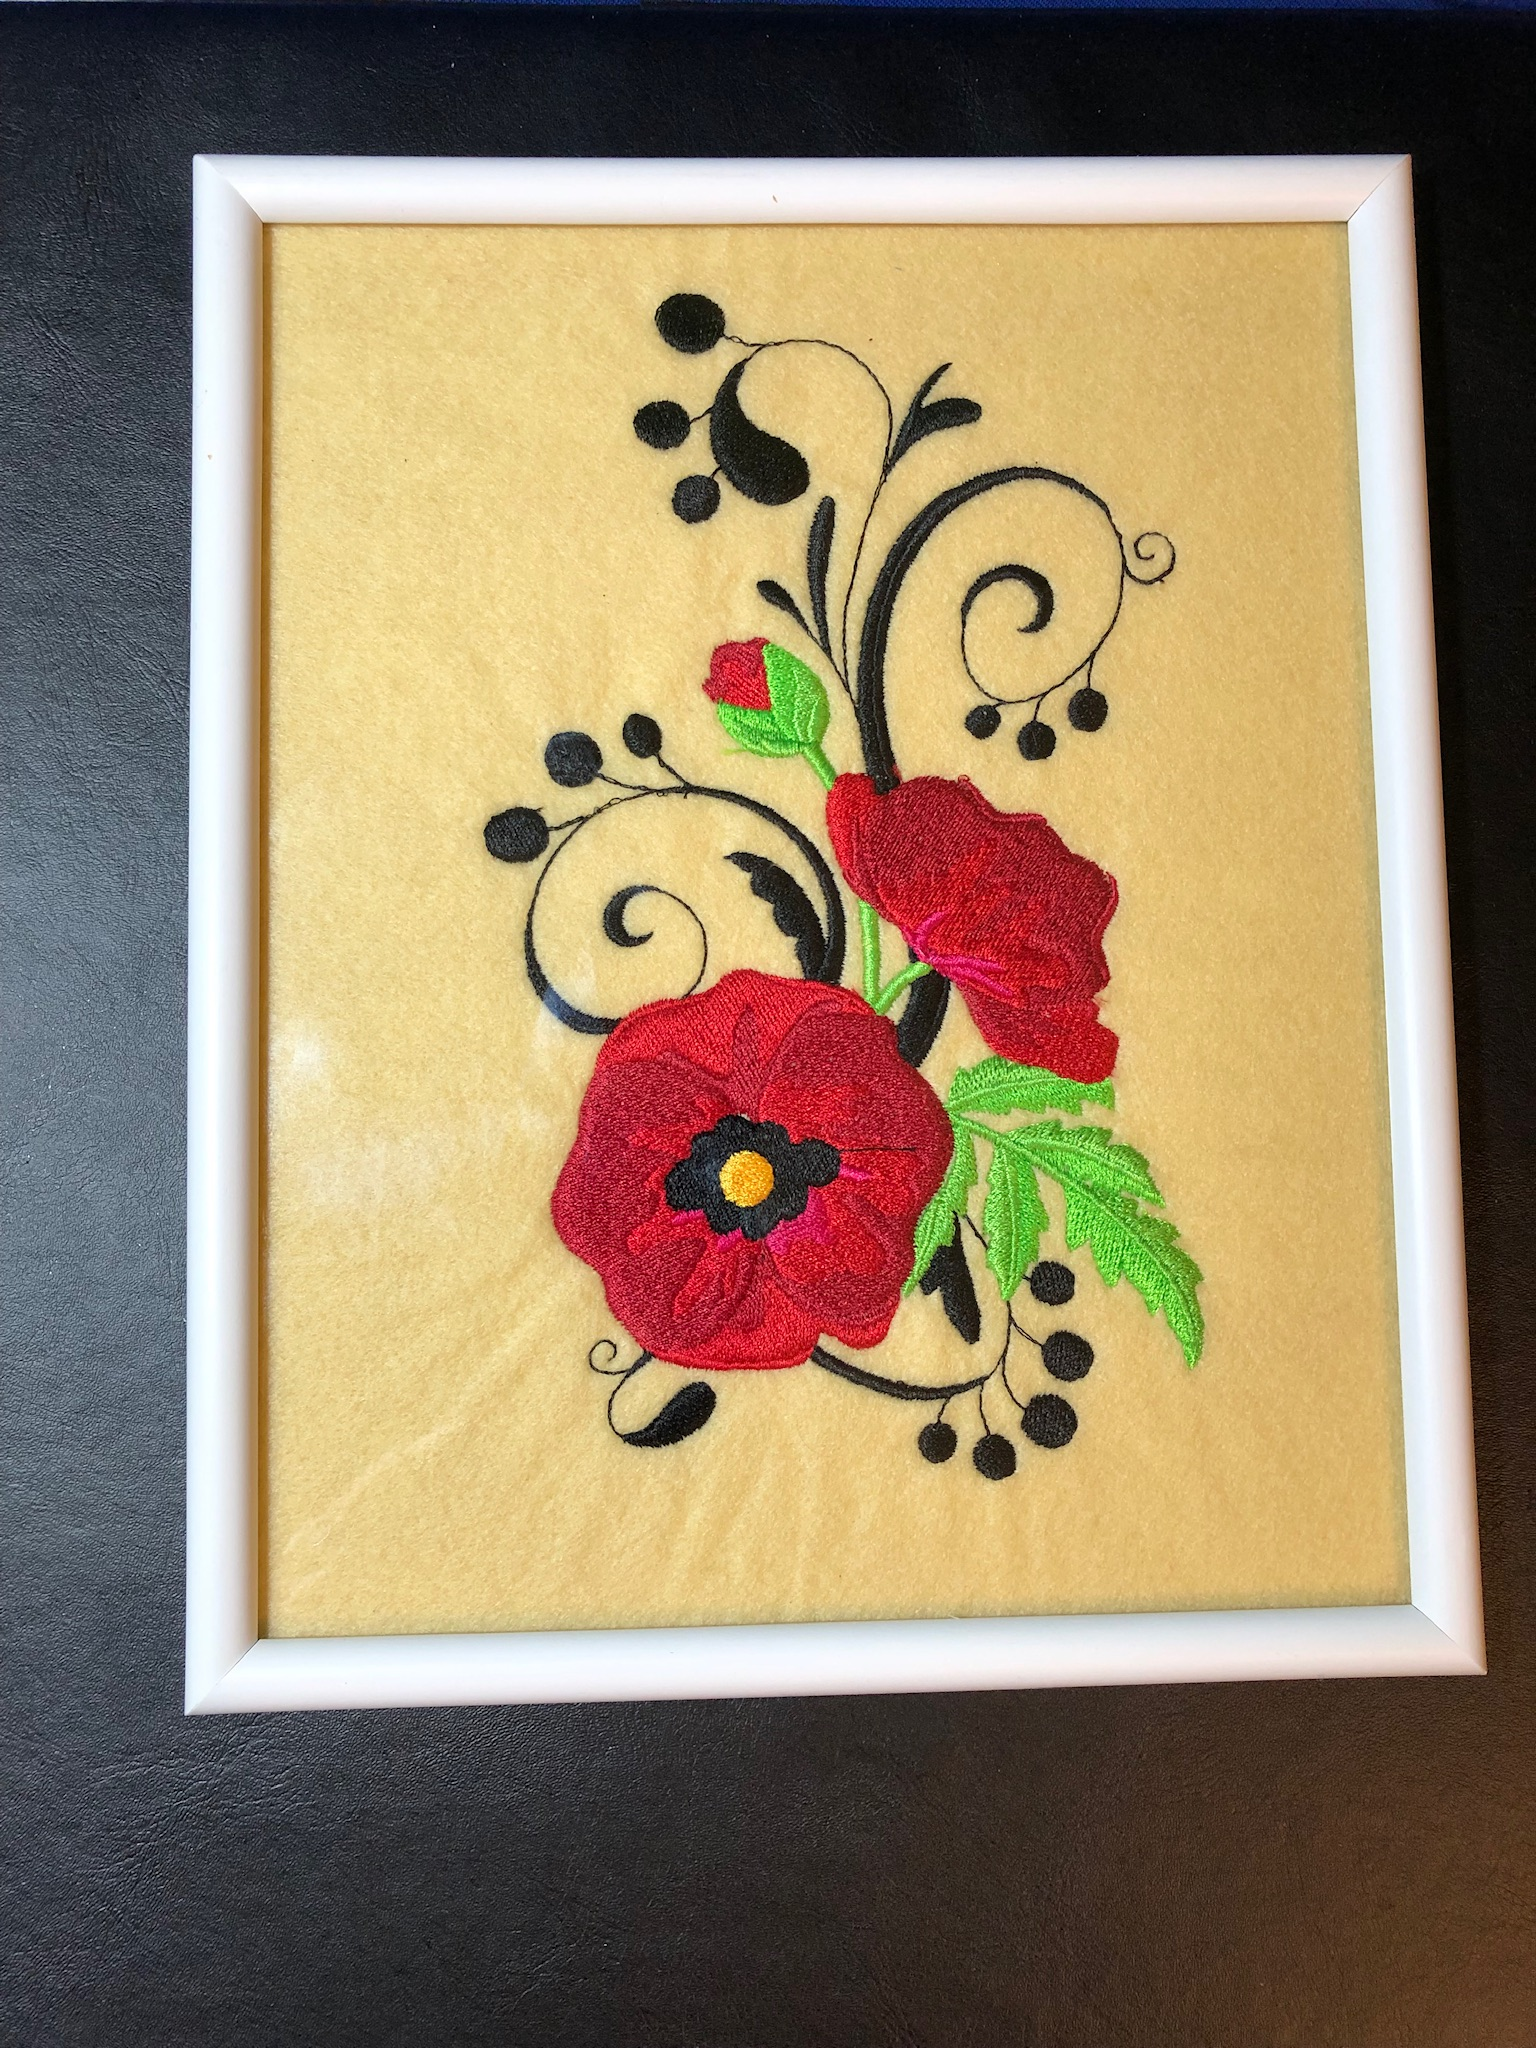 Embroidery/42378C96-1BC5-4280-B1CC-8D767188C687.jpeg